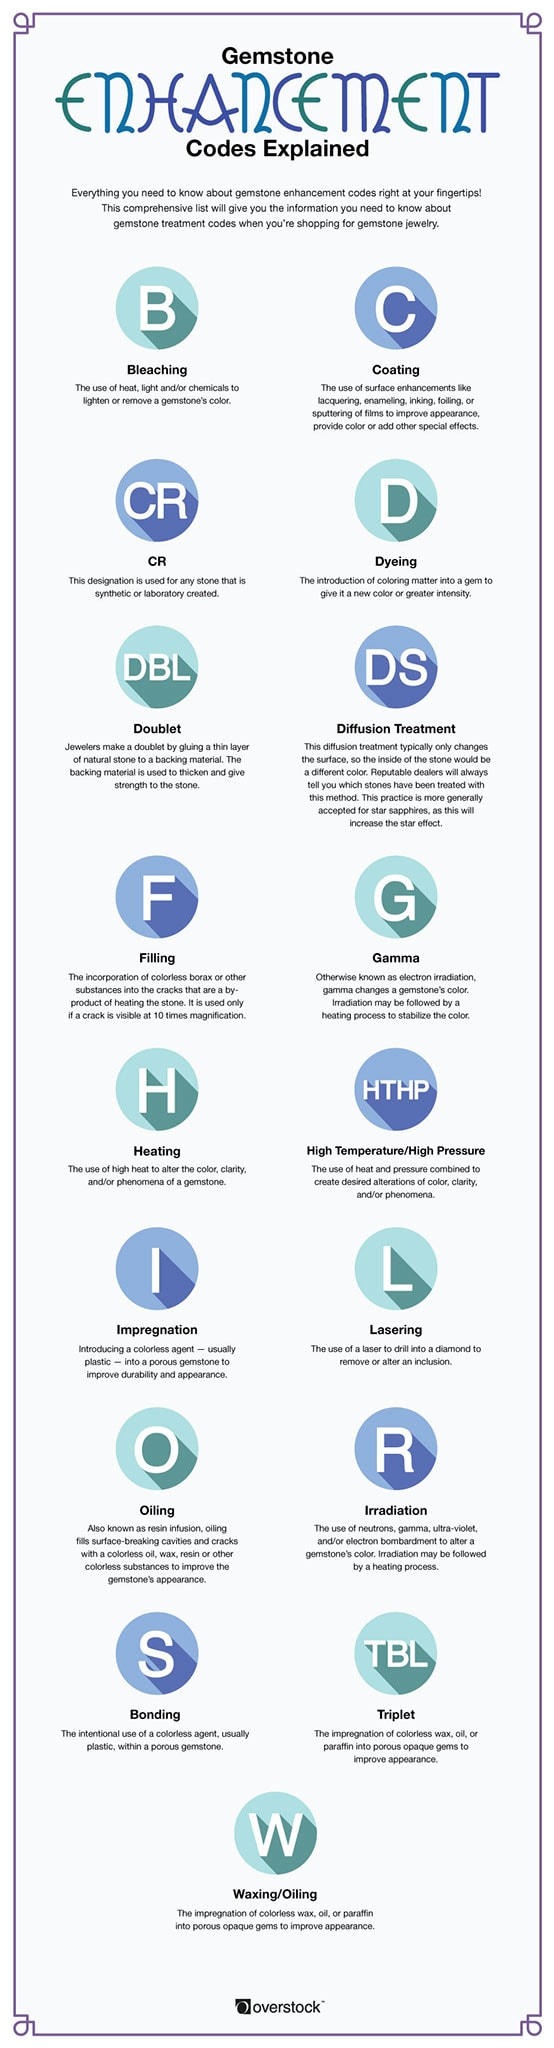 Enhancement Code Infographic